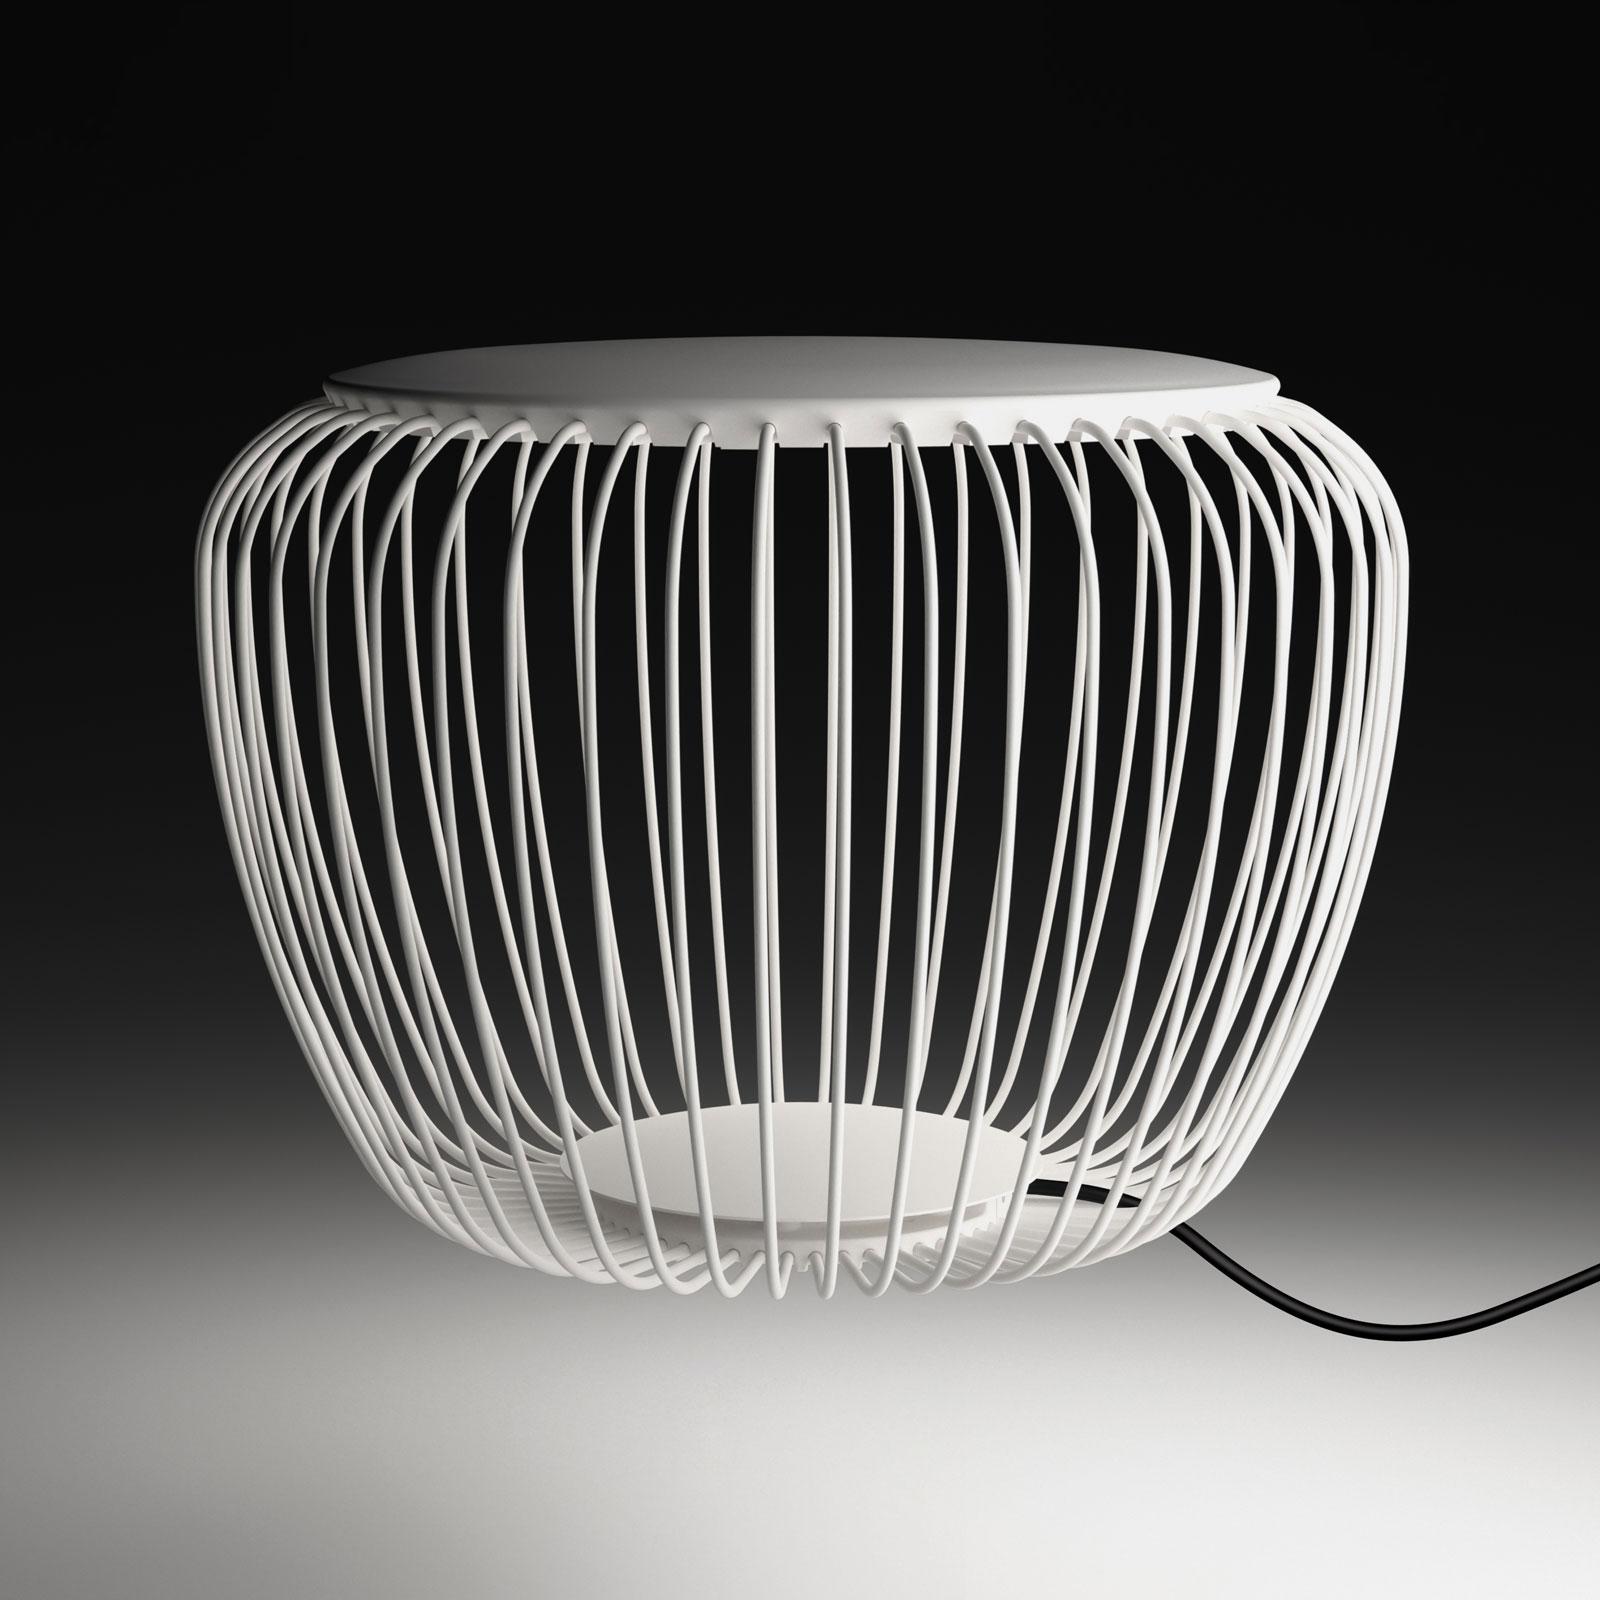 Vibia Meridiano 4710 udendørslampe, Ø 64 cm, creme